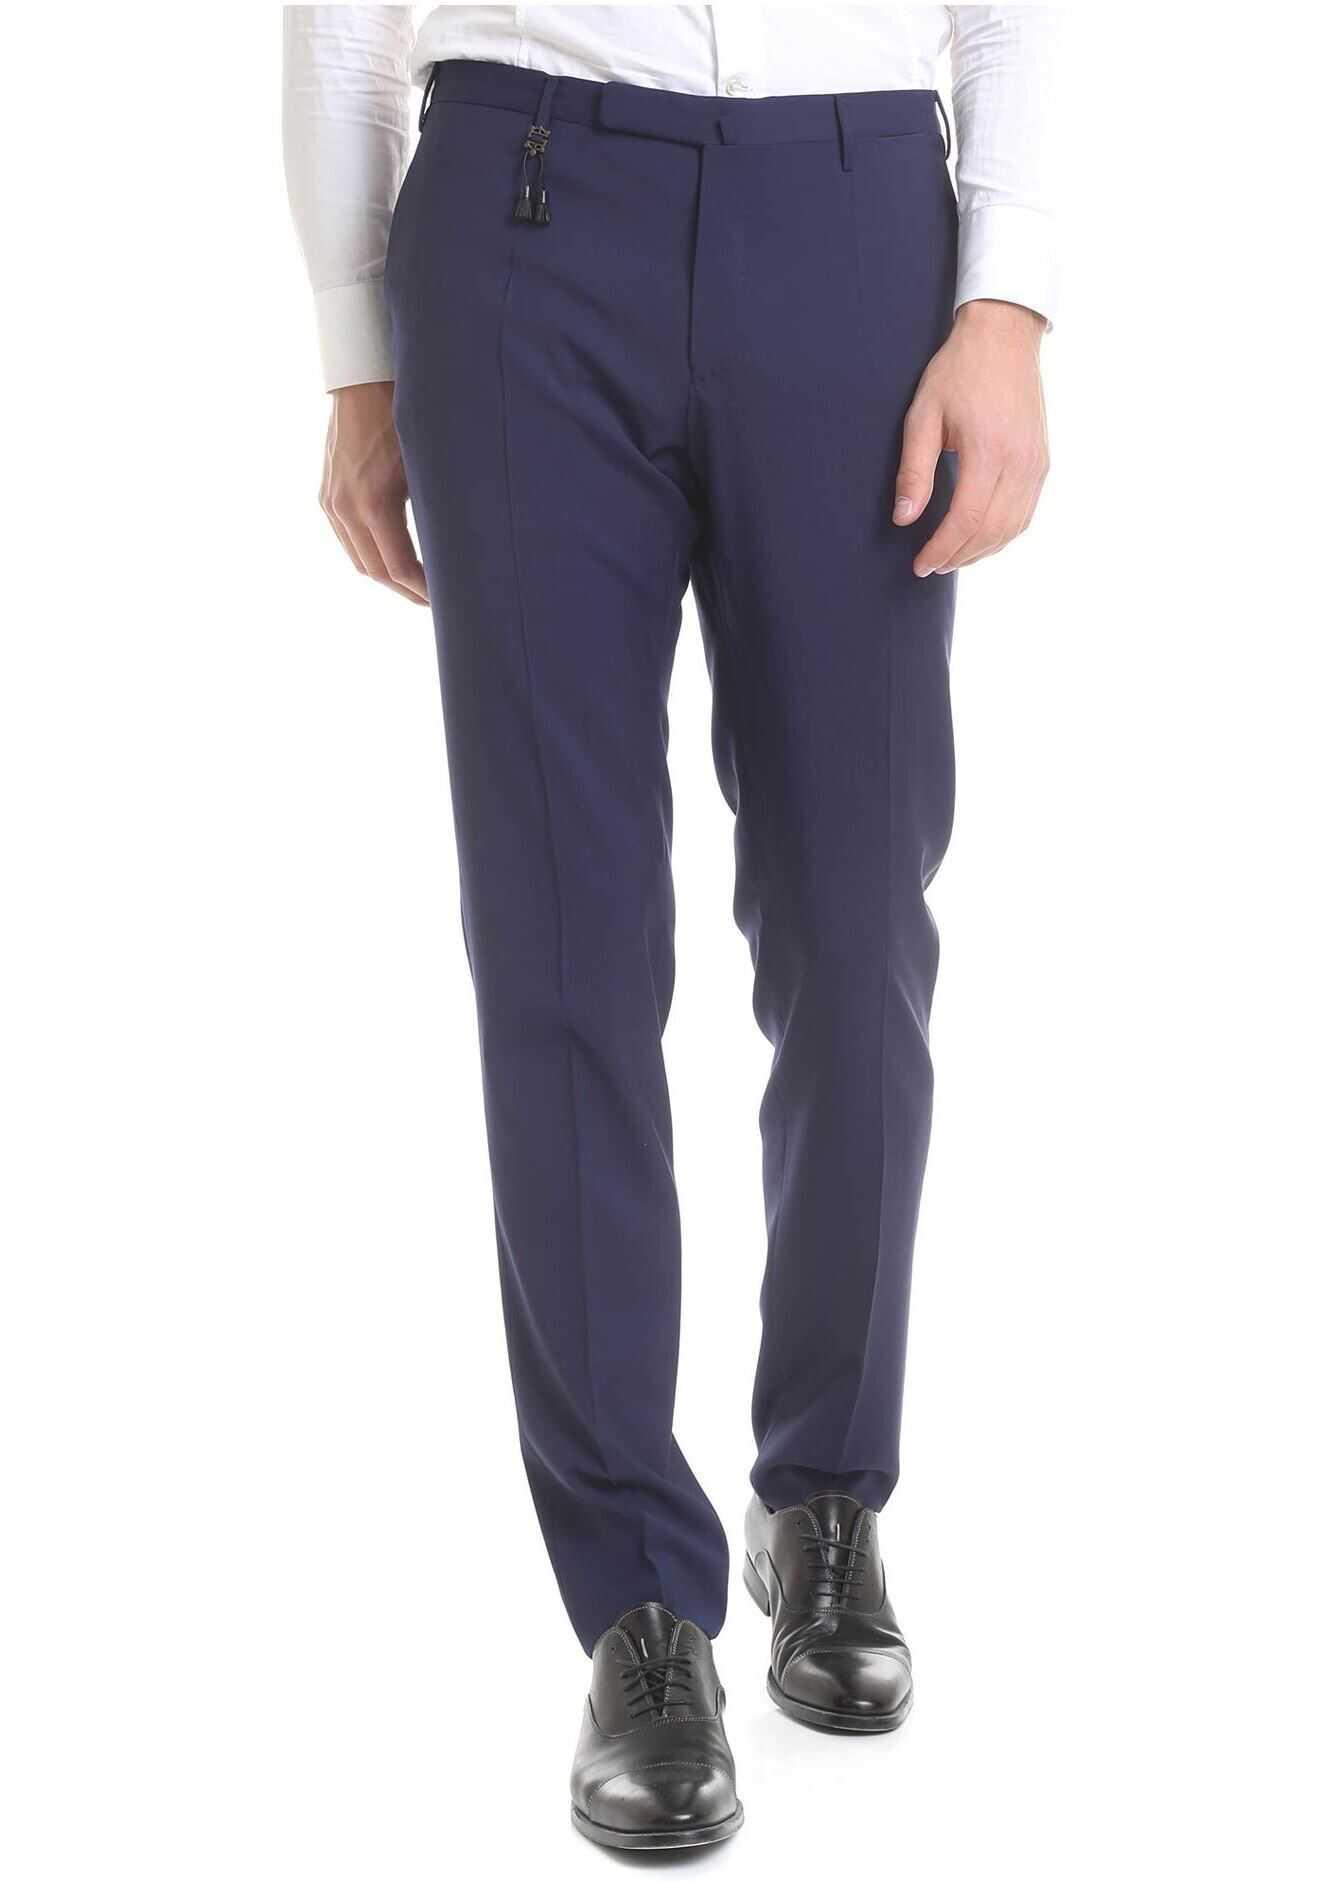 Incotex Bluette Virgin Wool Trousers Blue imagine